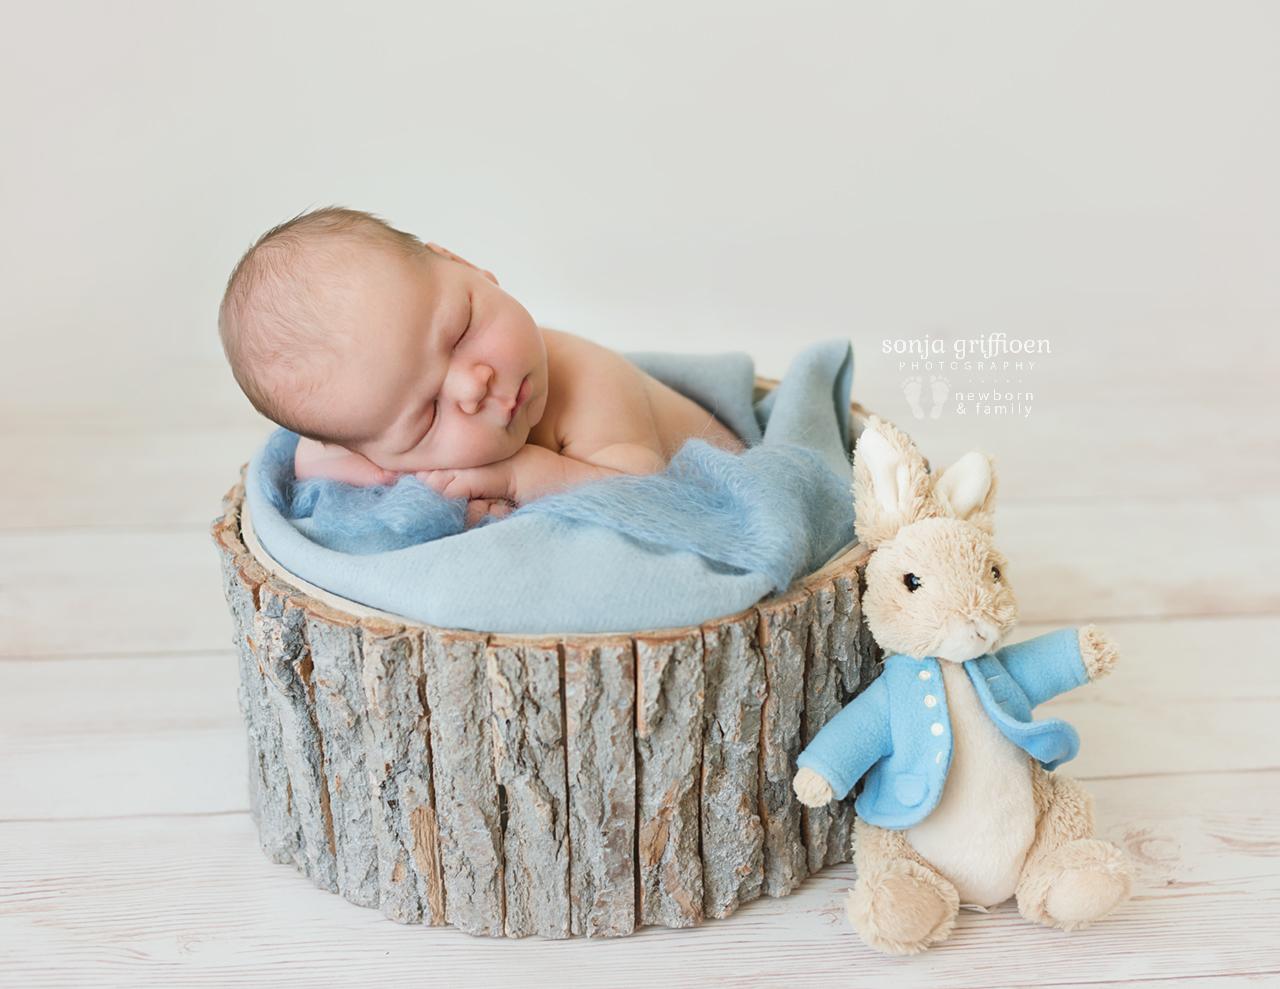 Joshua-Newborn-Brisbane-Newborn-Photographer-Sonja-Griffioen-03.jpg